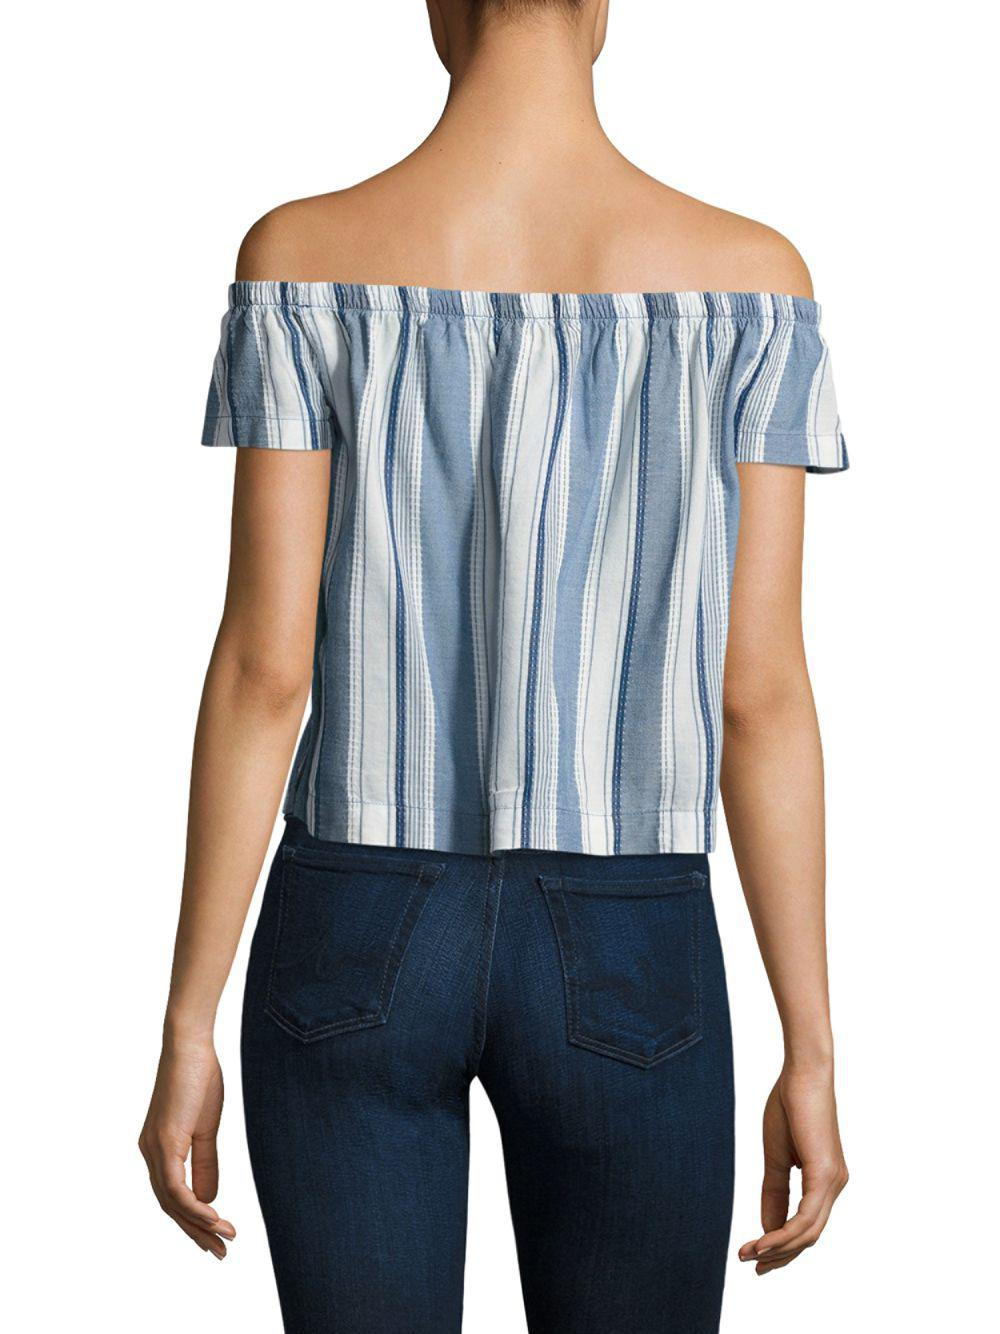 089342bc9b9f87 Lyst - Cinq À Sept Striped Off-the-shoulder Top in Blue - Save 54%